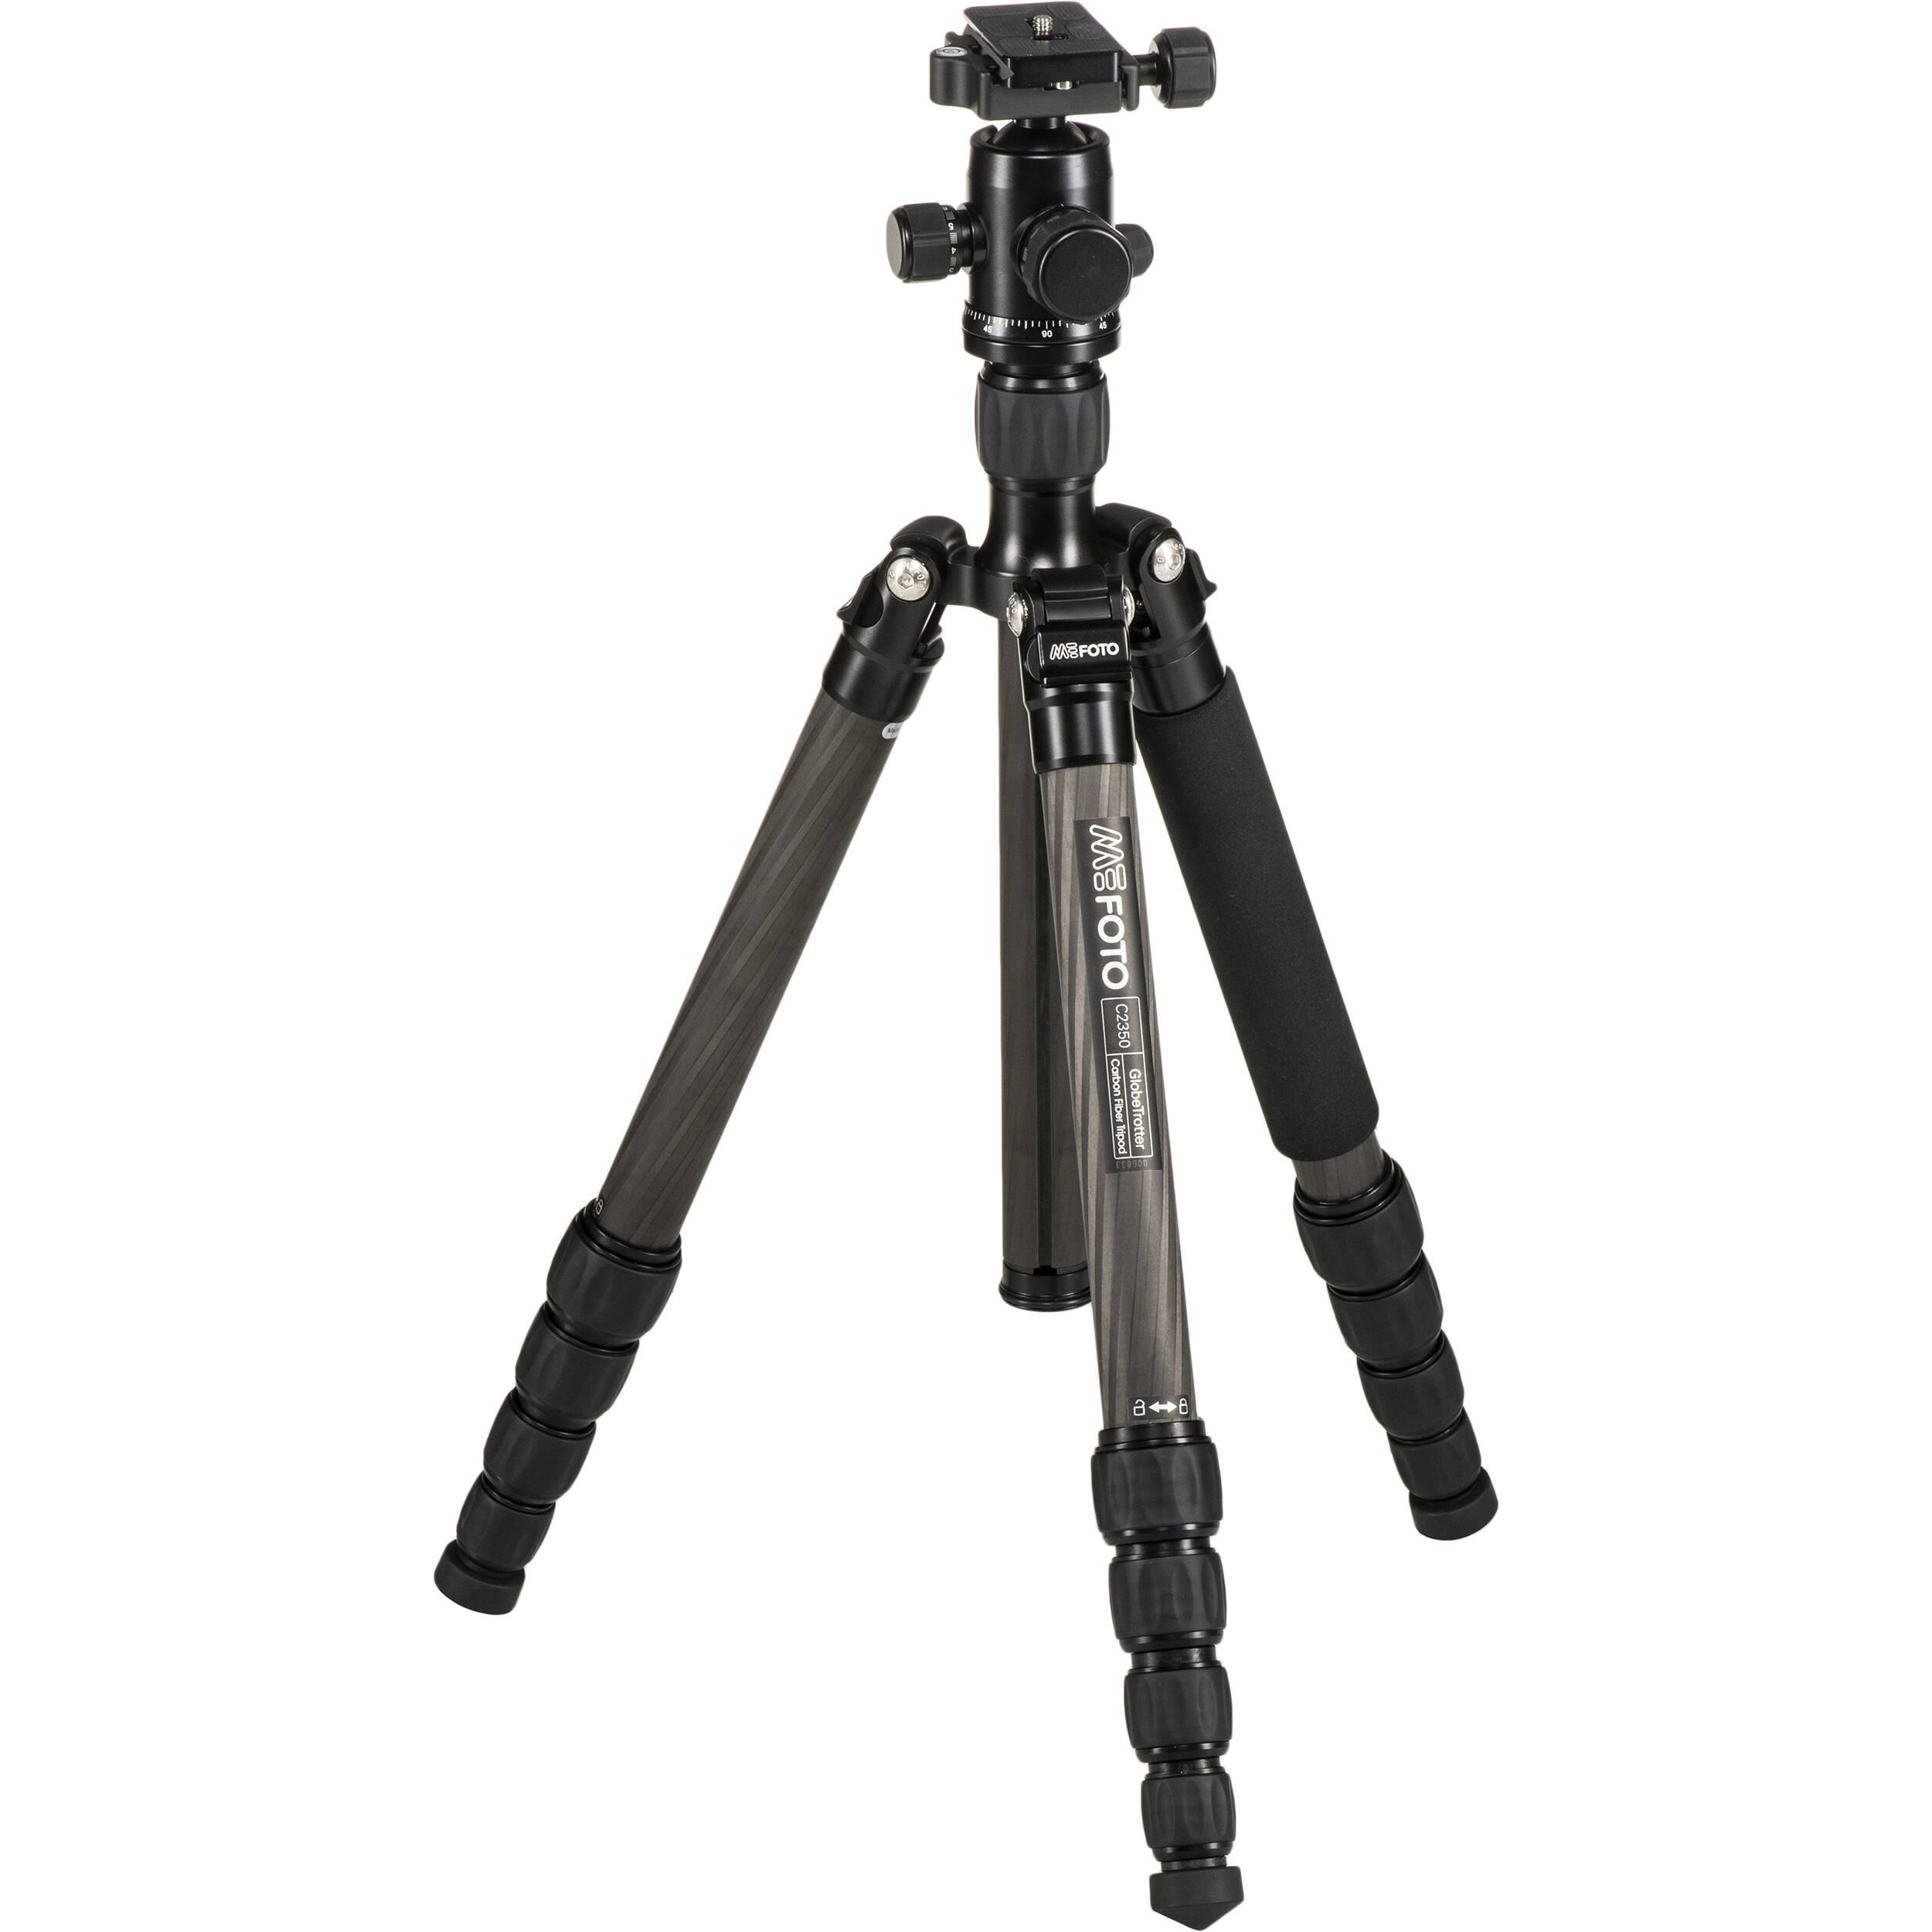 Camera Tripods For Dslr Camera mefoto globetrotter carbon fiber travel tripod kit c2350q2k bh black